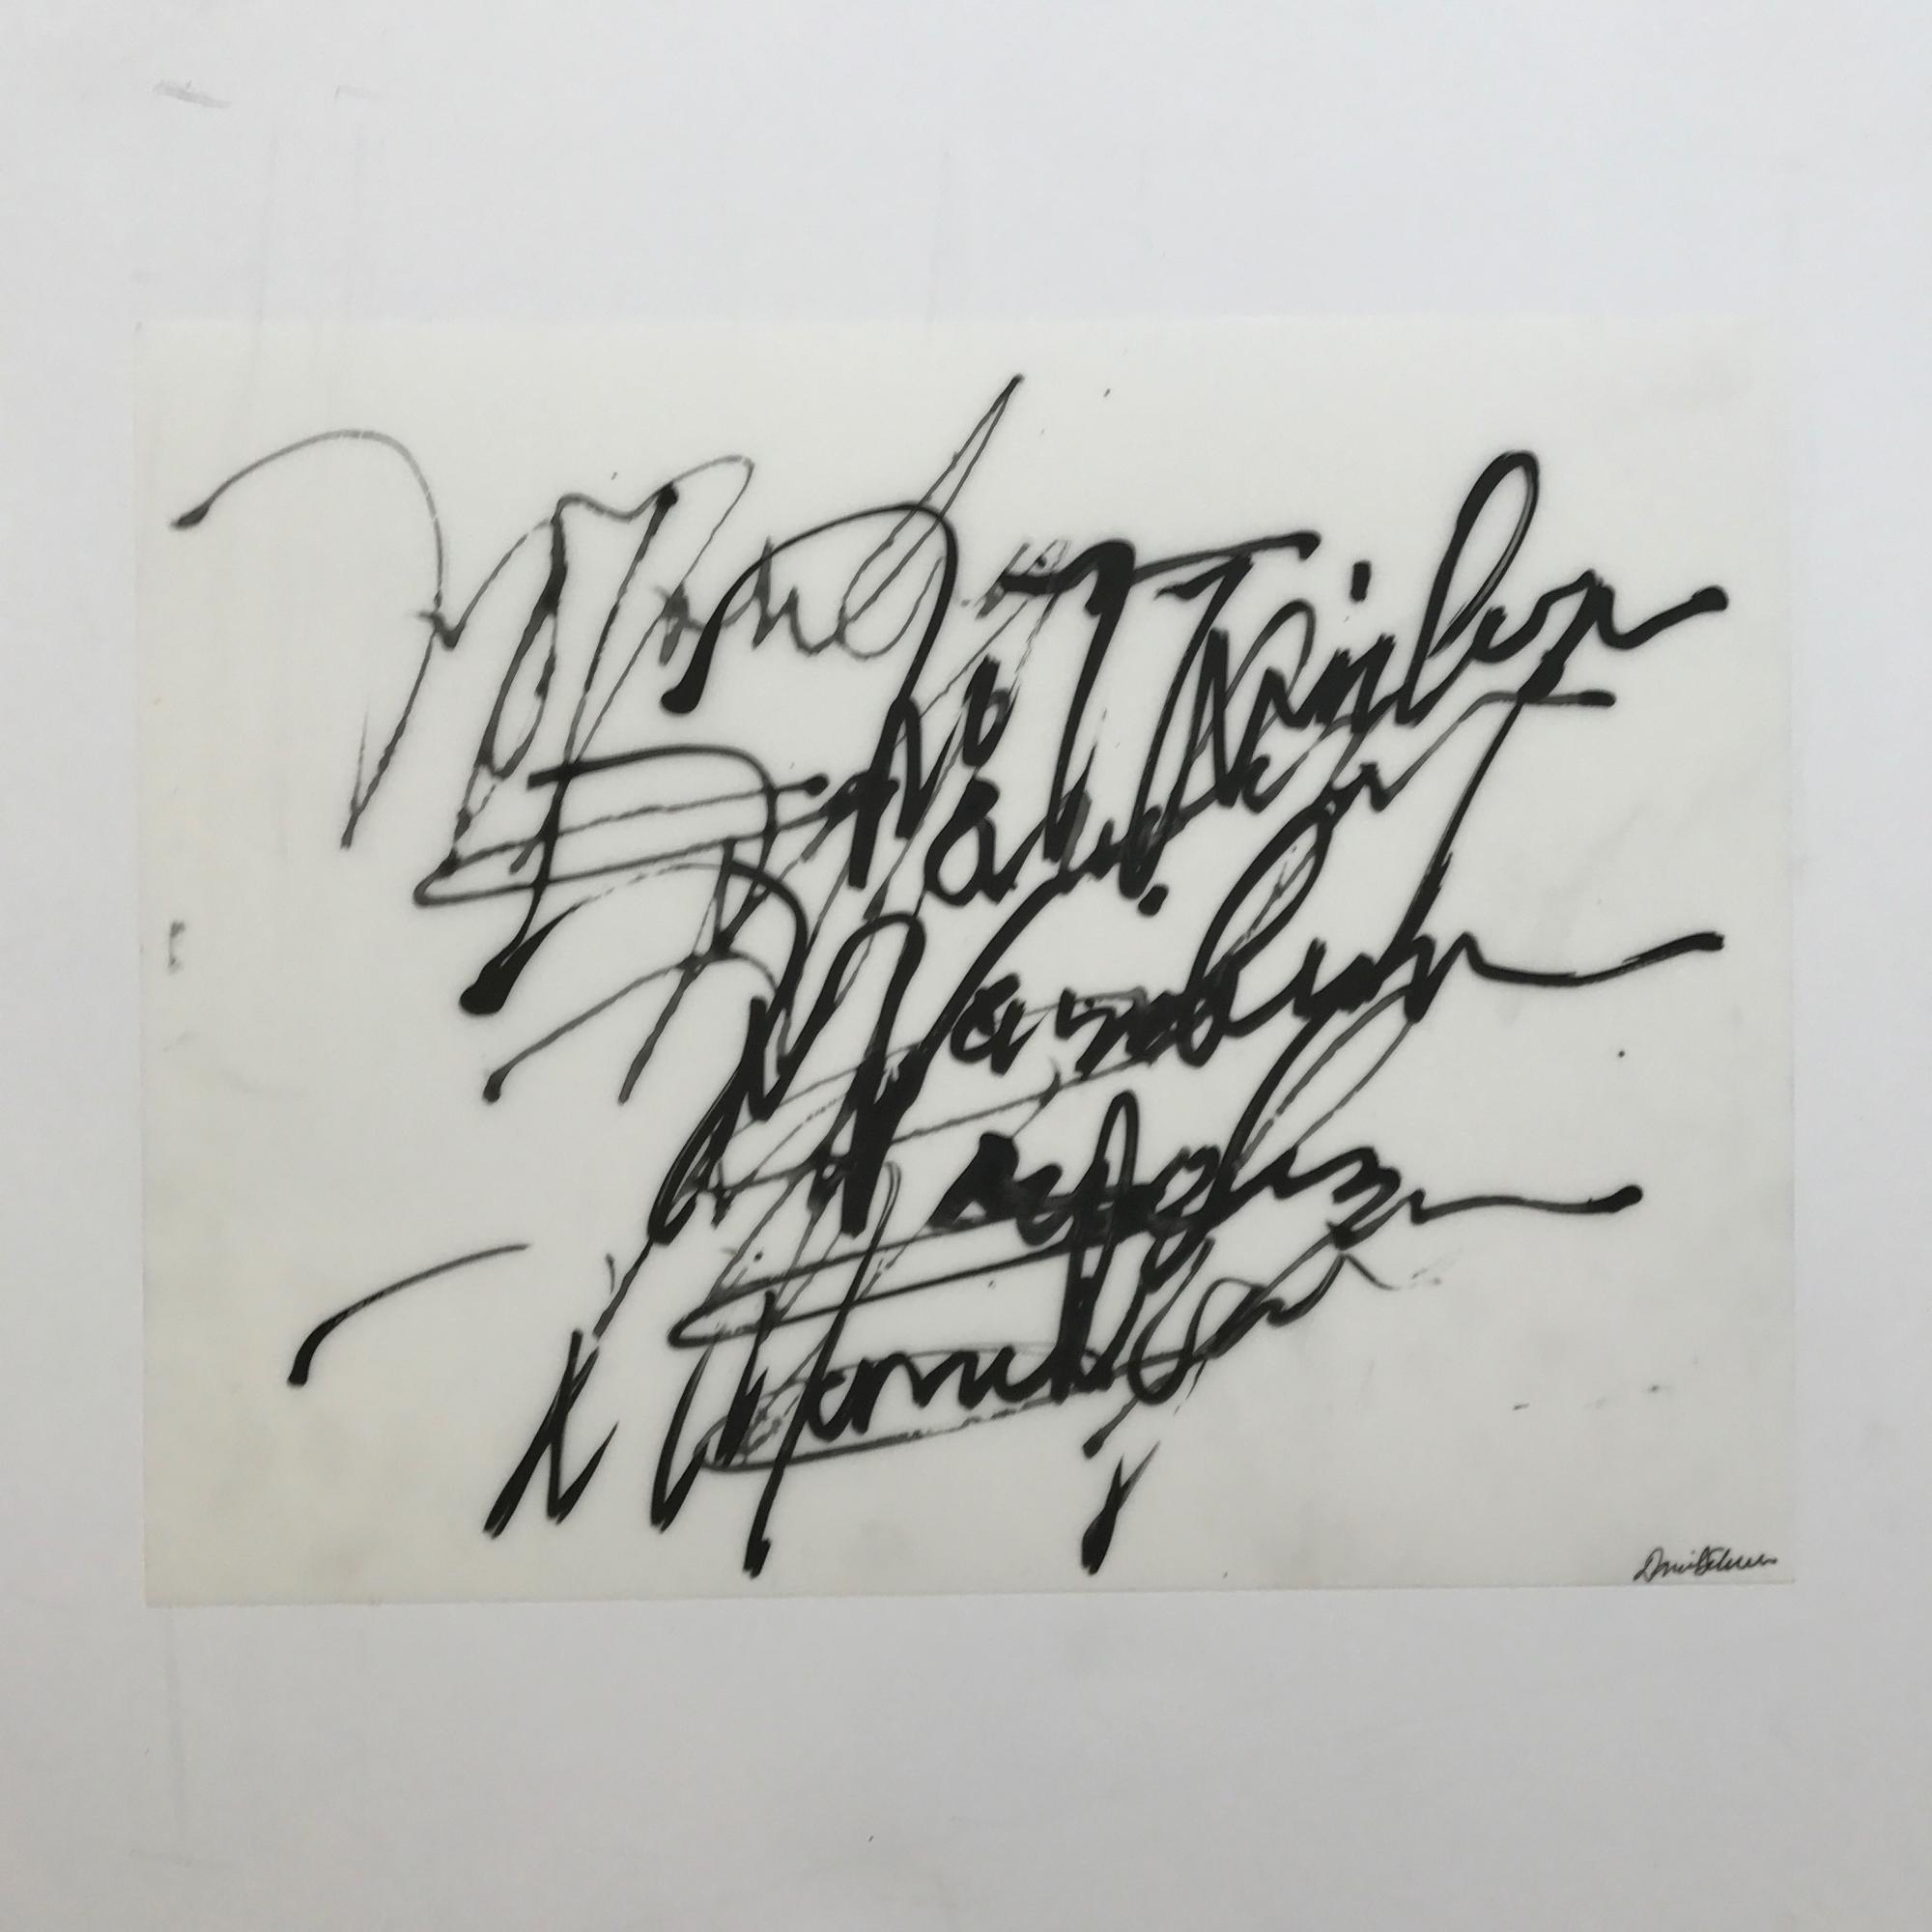 Monroe - Small 4 by Daniel Schneider